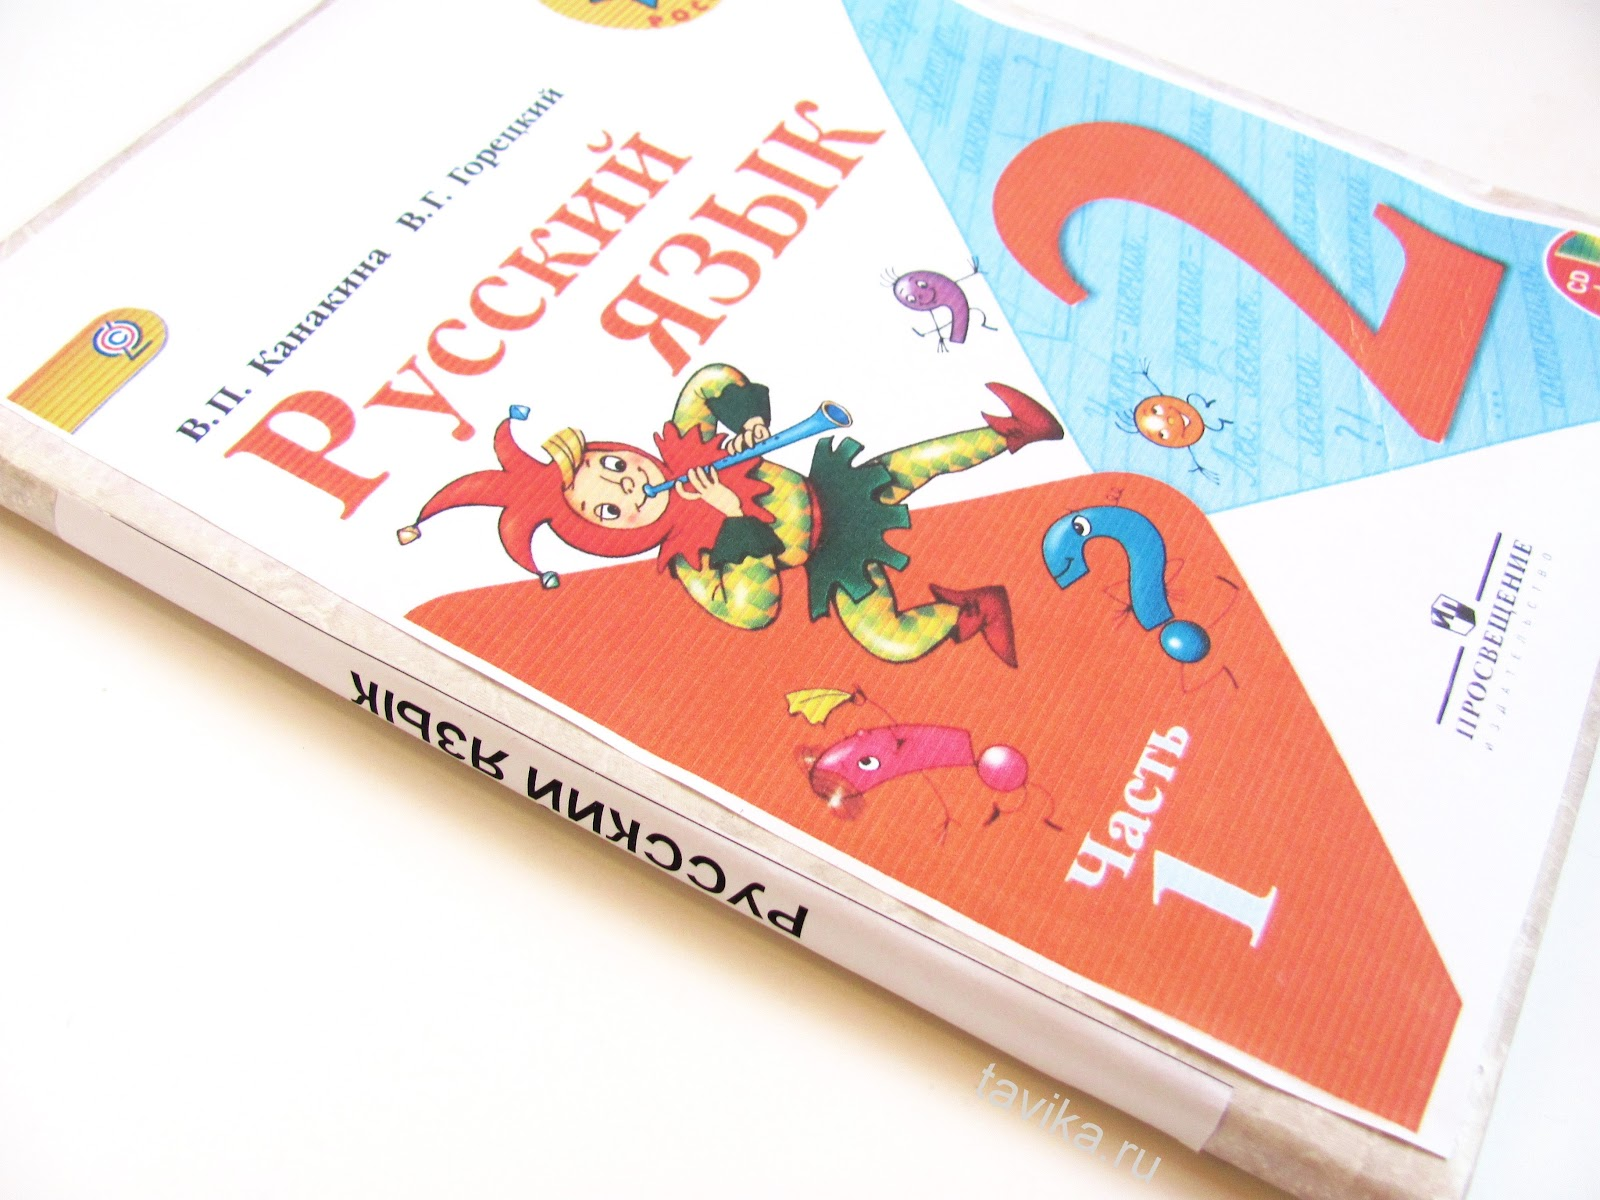 Чем обернуть учебники в домашних условиях фото